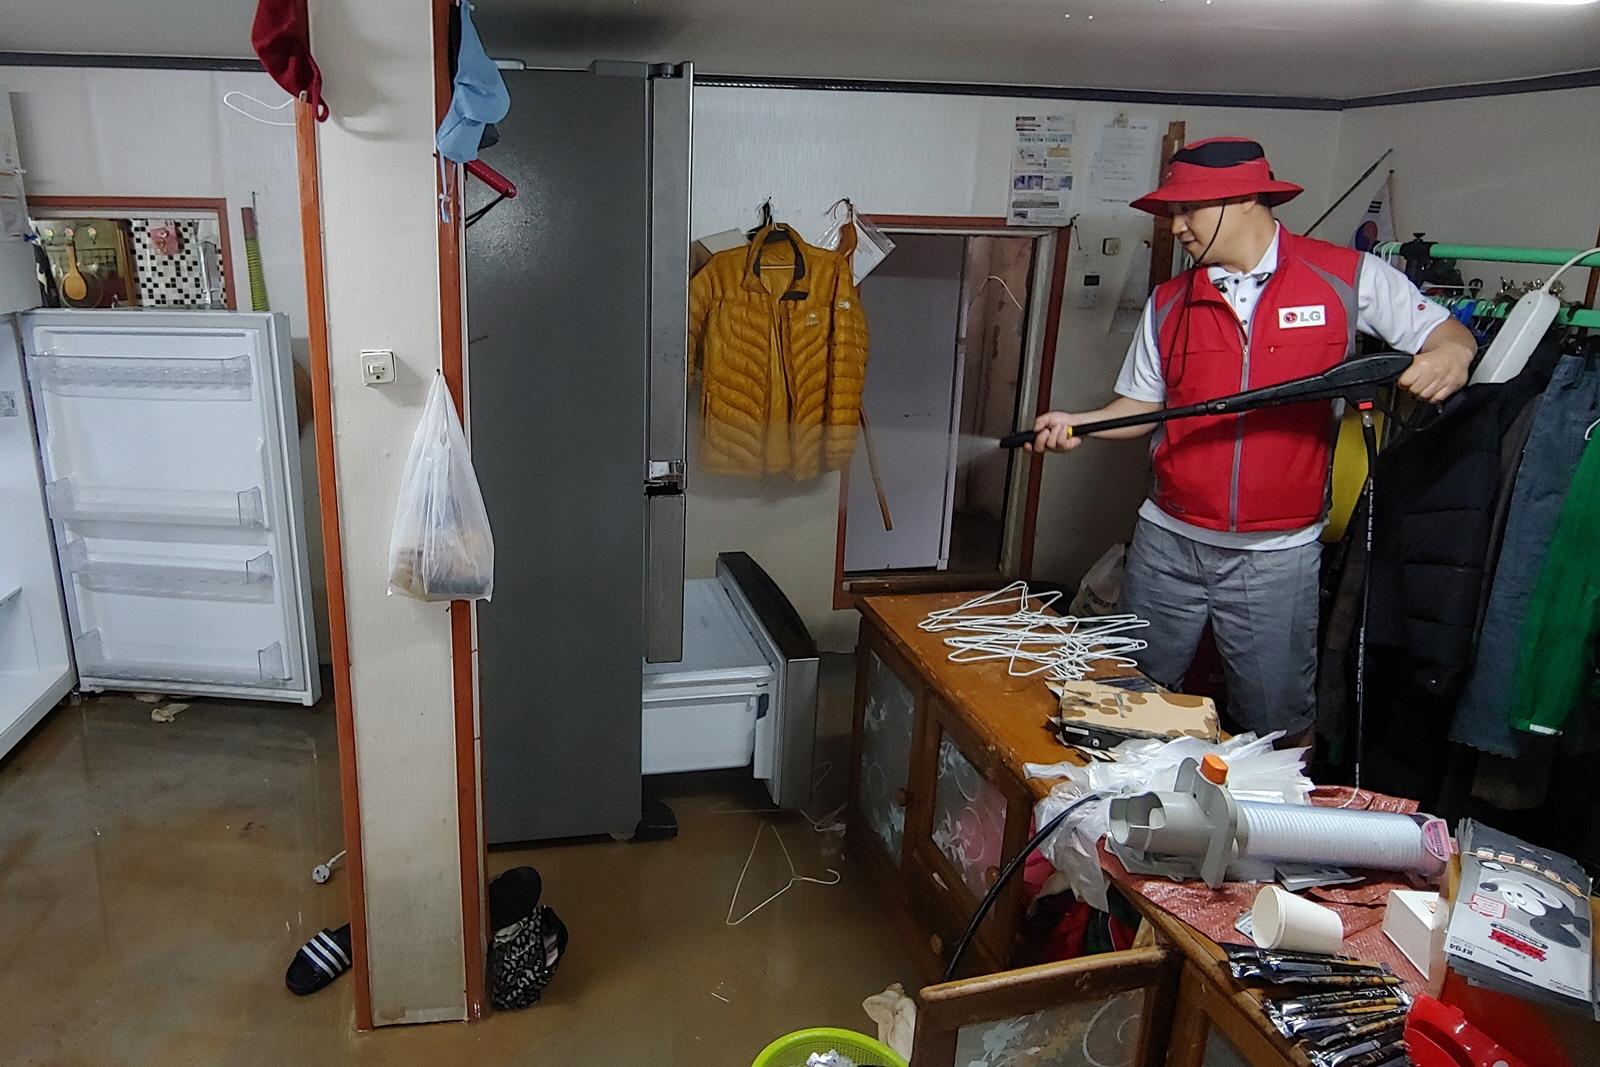 LG전자가 제18호 태풍 '미탁'으로 인해 피해가 발생한 강원 삼척시에서 수해 복구 활동을 진행하고 있다.